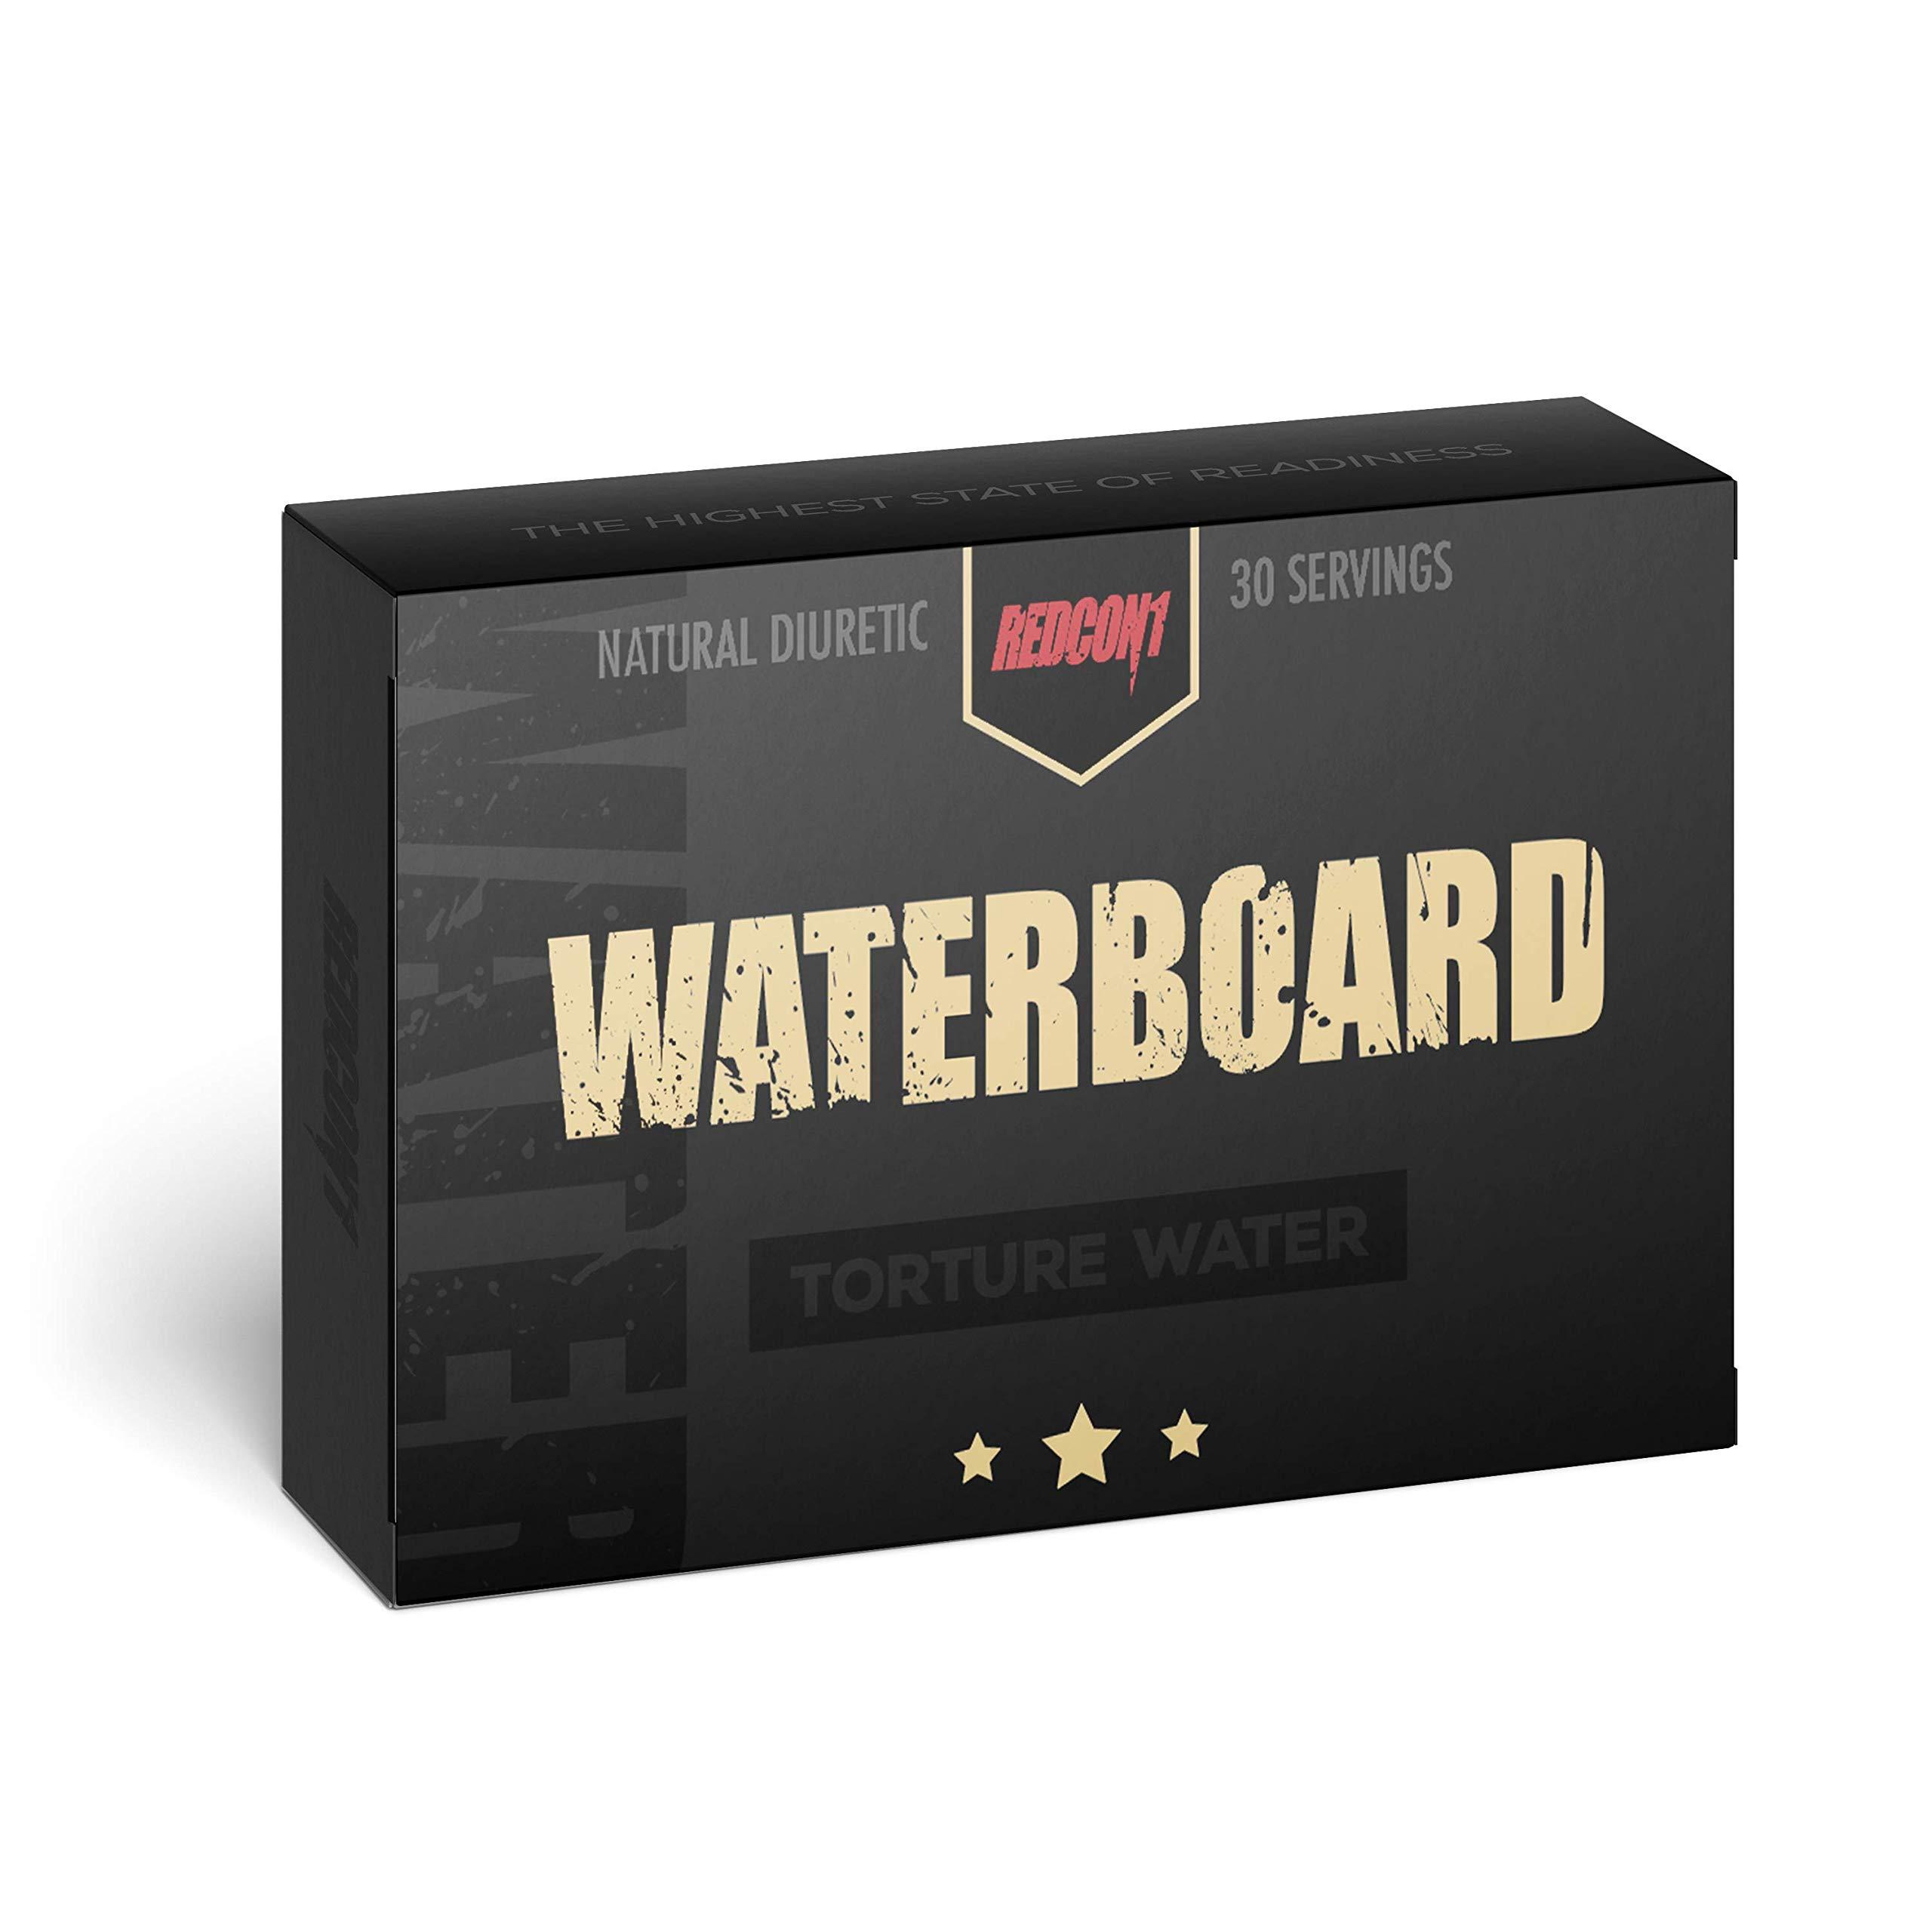 Waterboard - Water Loss Formula